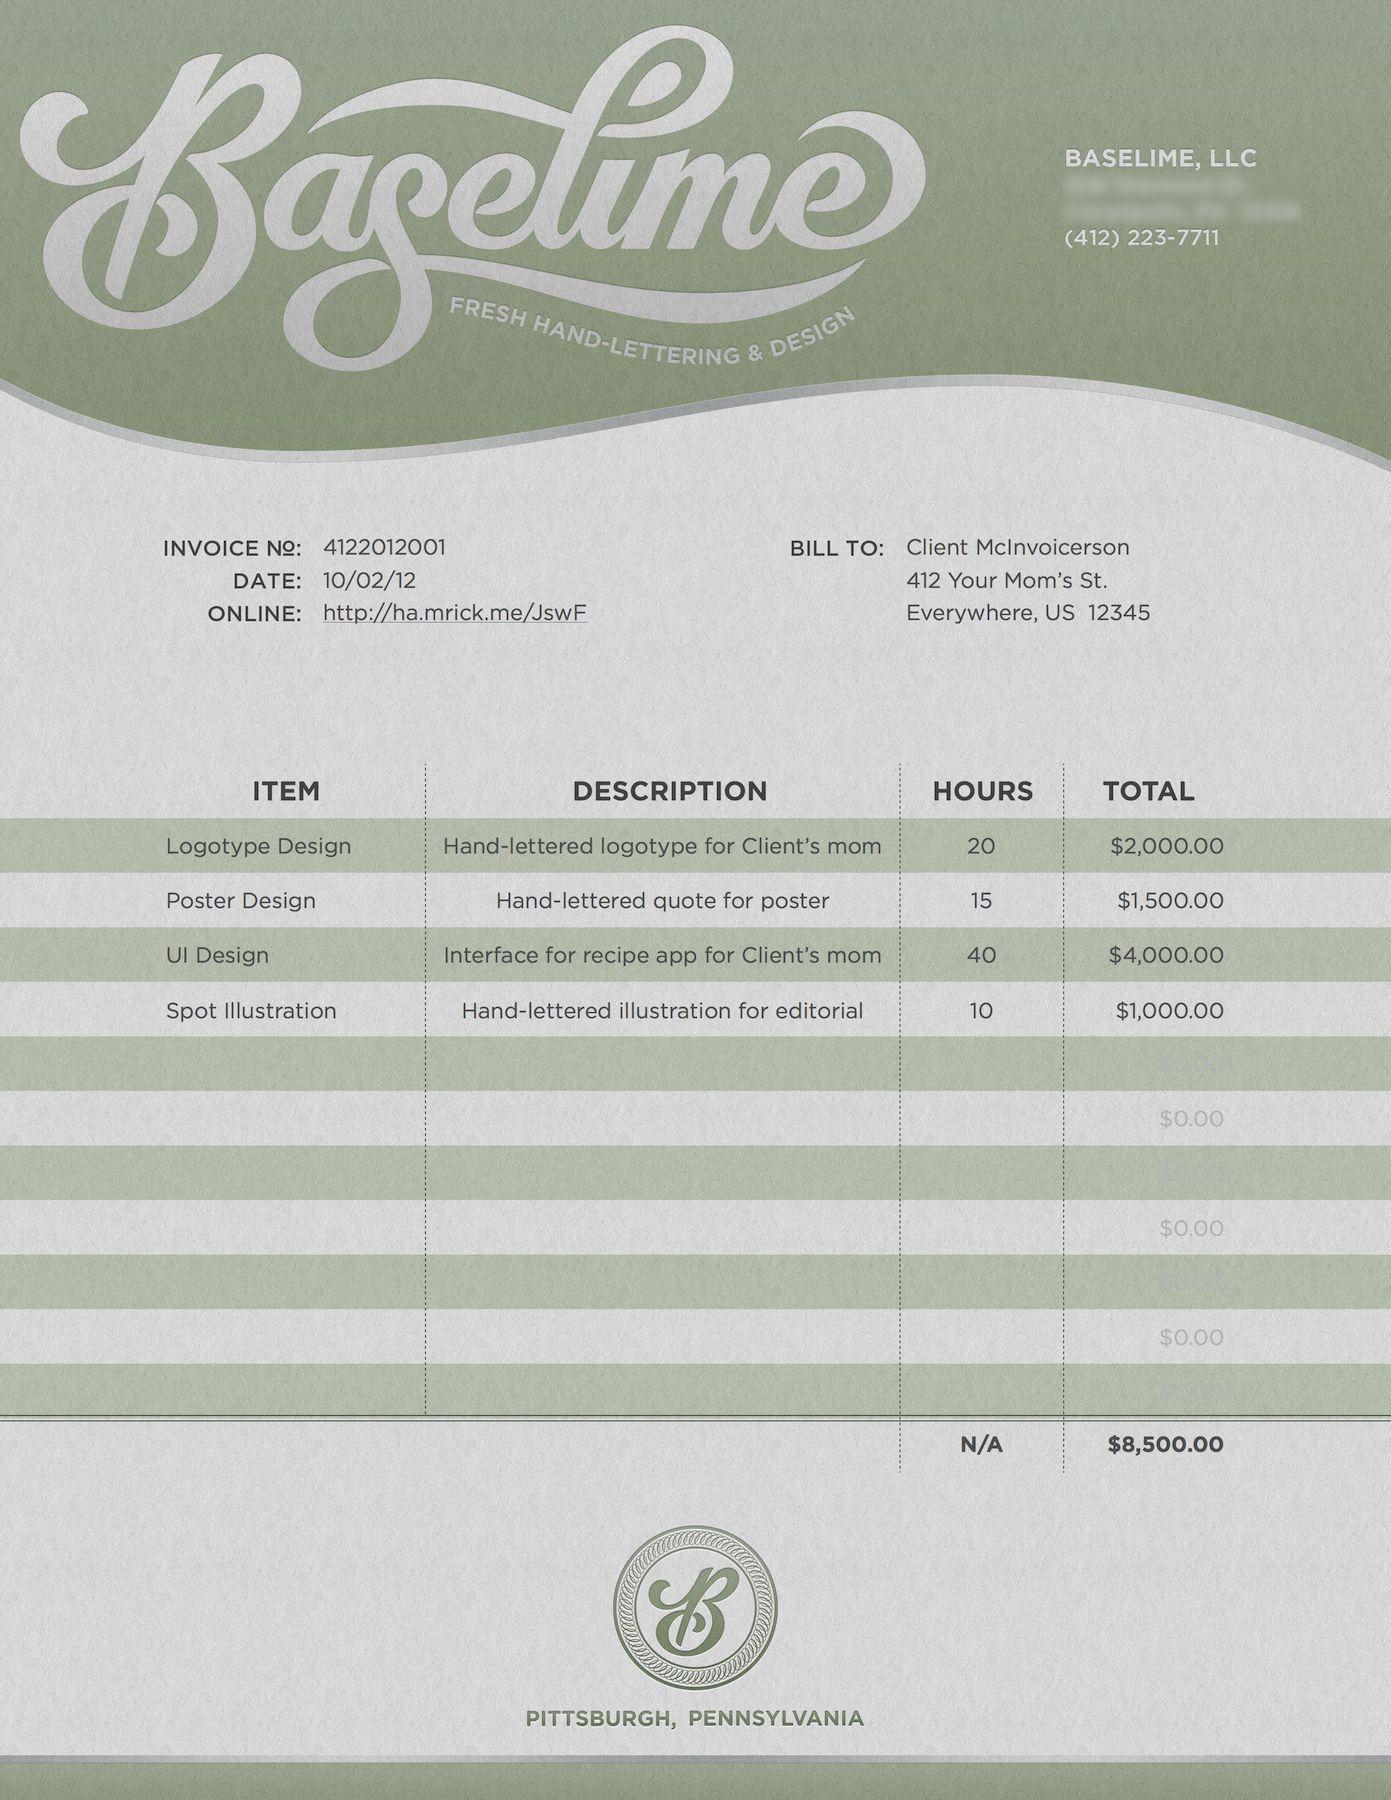 002 Awesome Freelance Graphic Designer Invoice Sample Highest Clarity Full